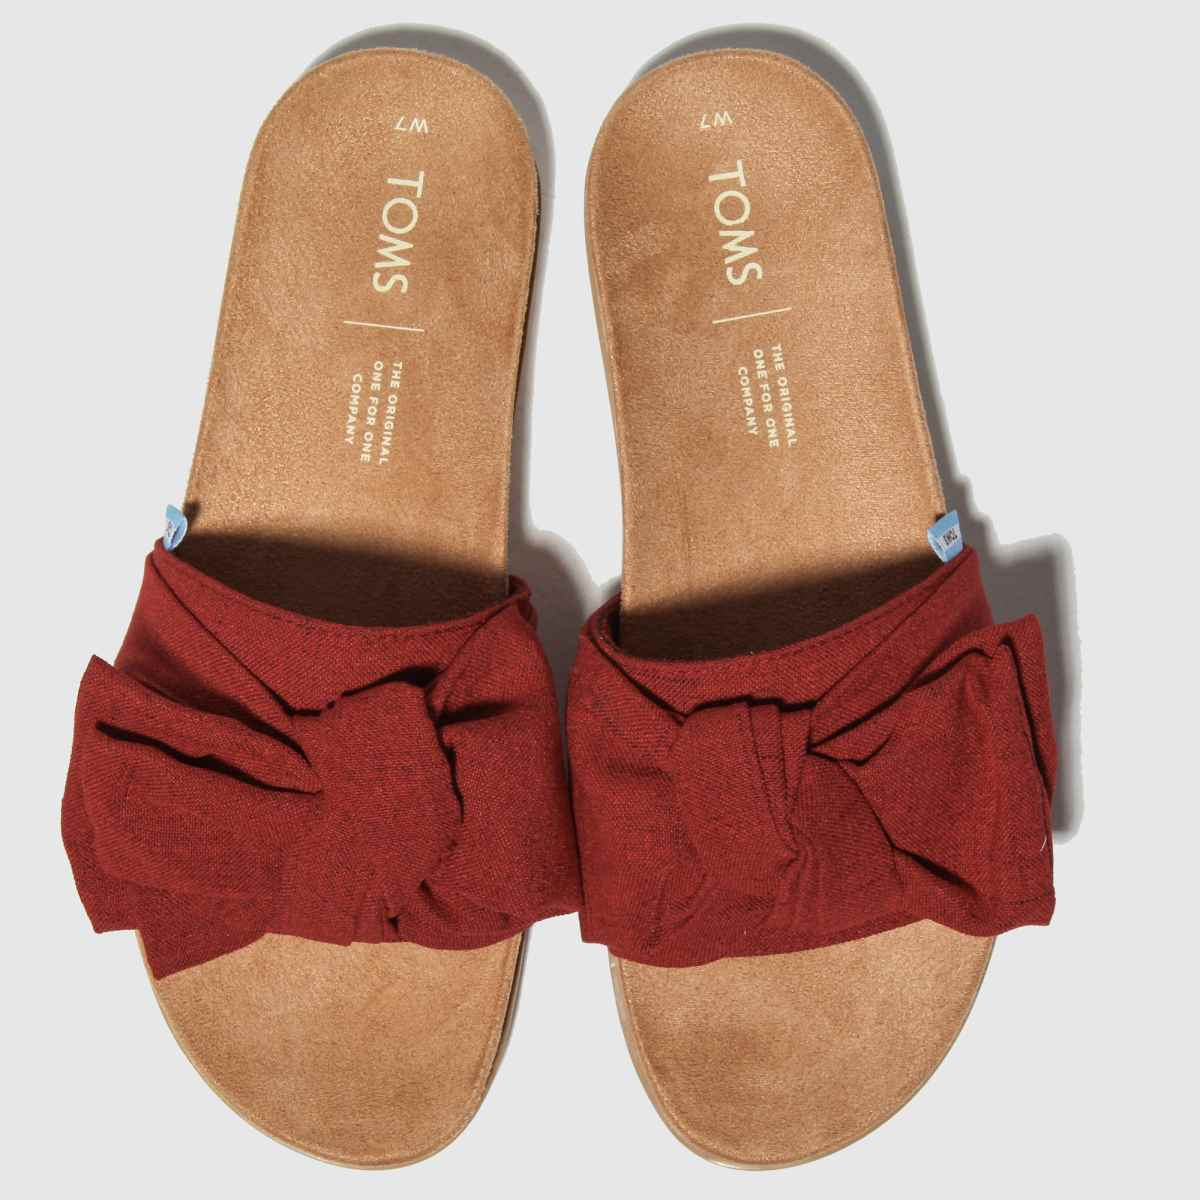 Toms Red Paradise Slide Sandals